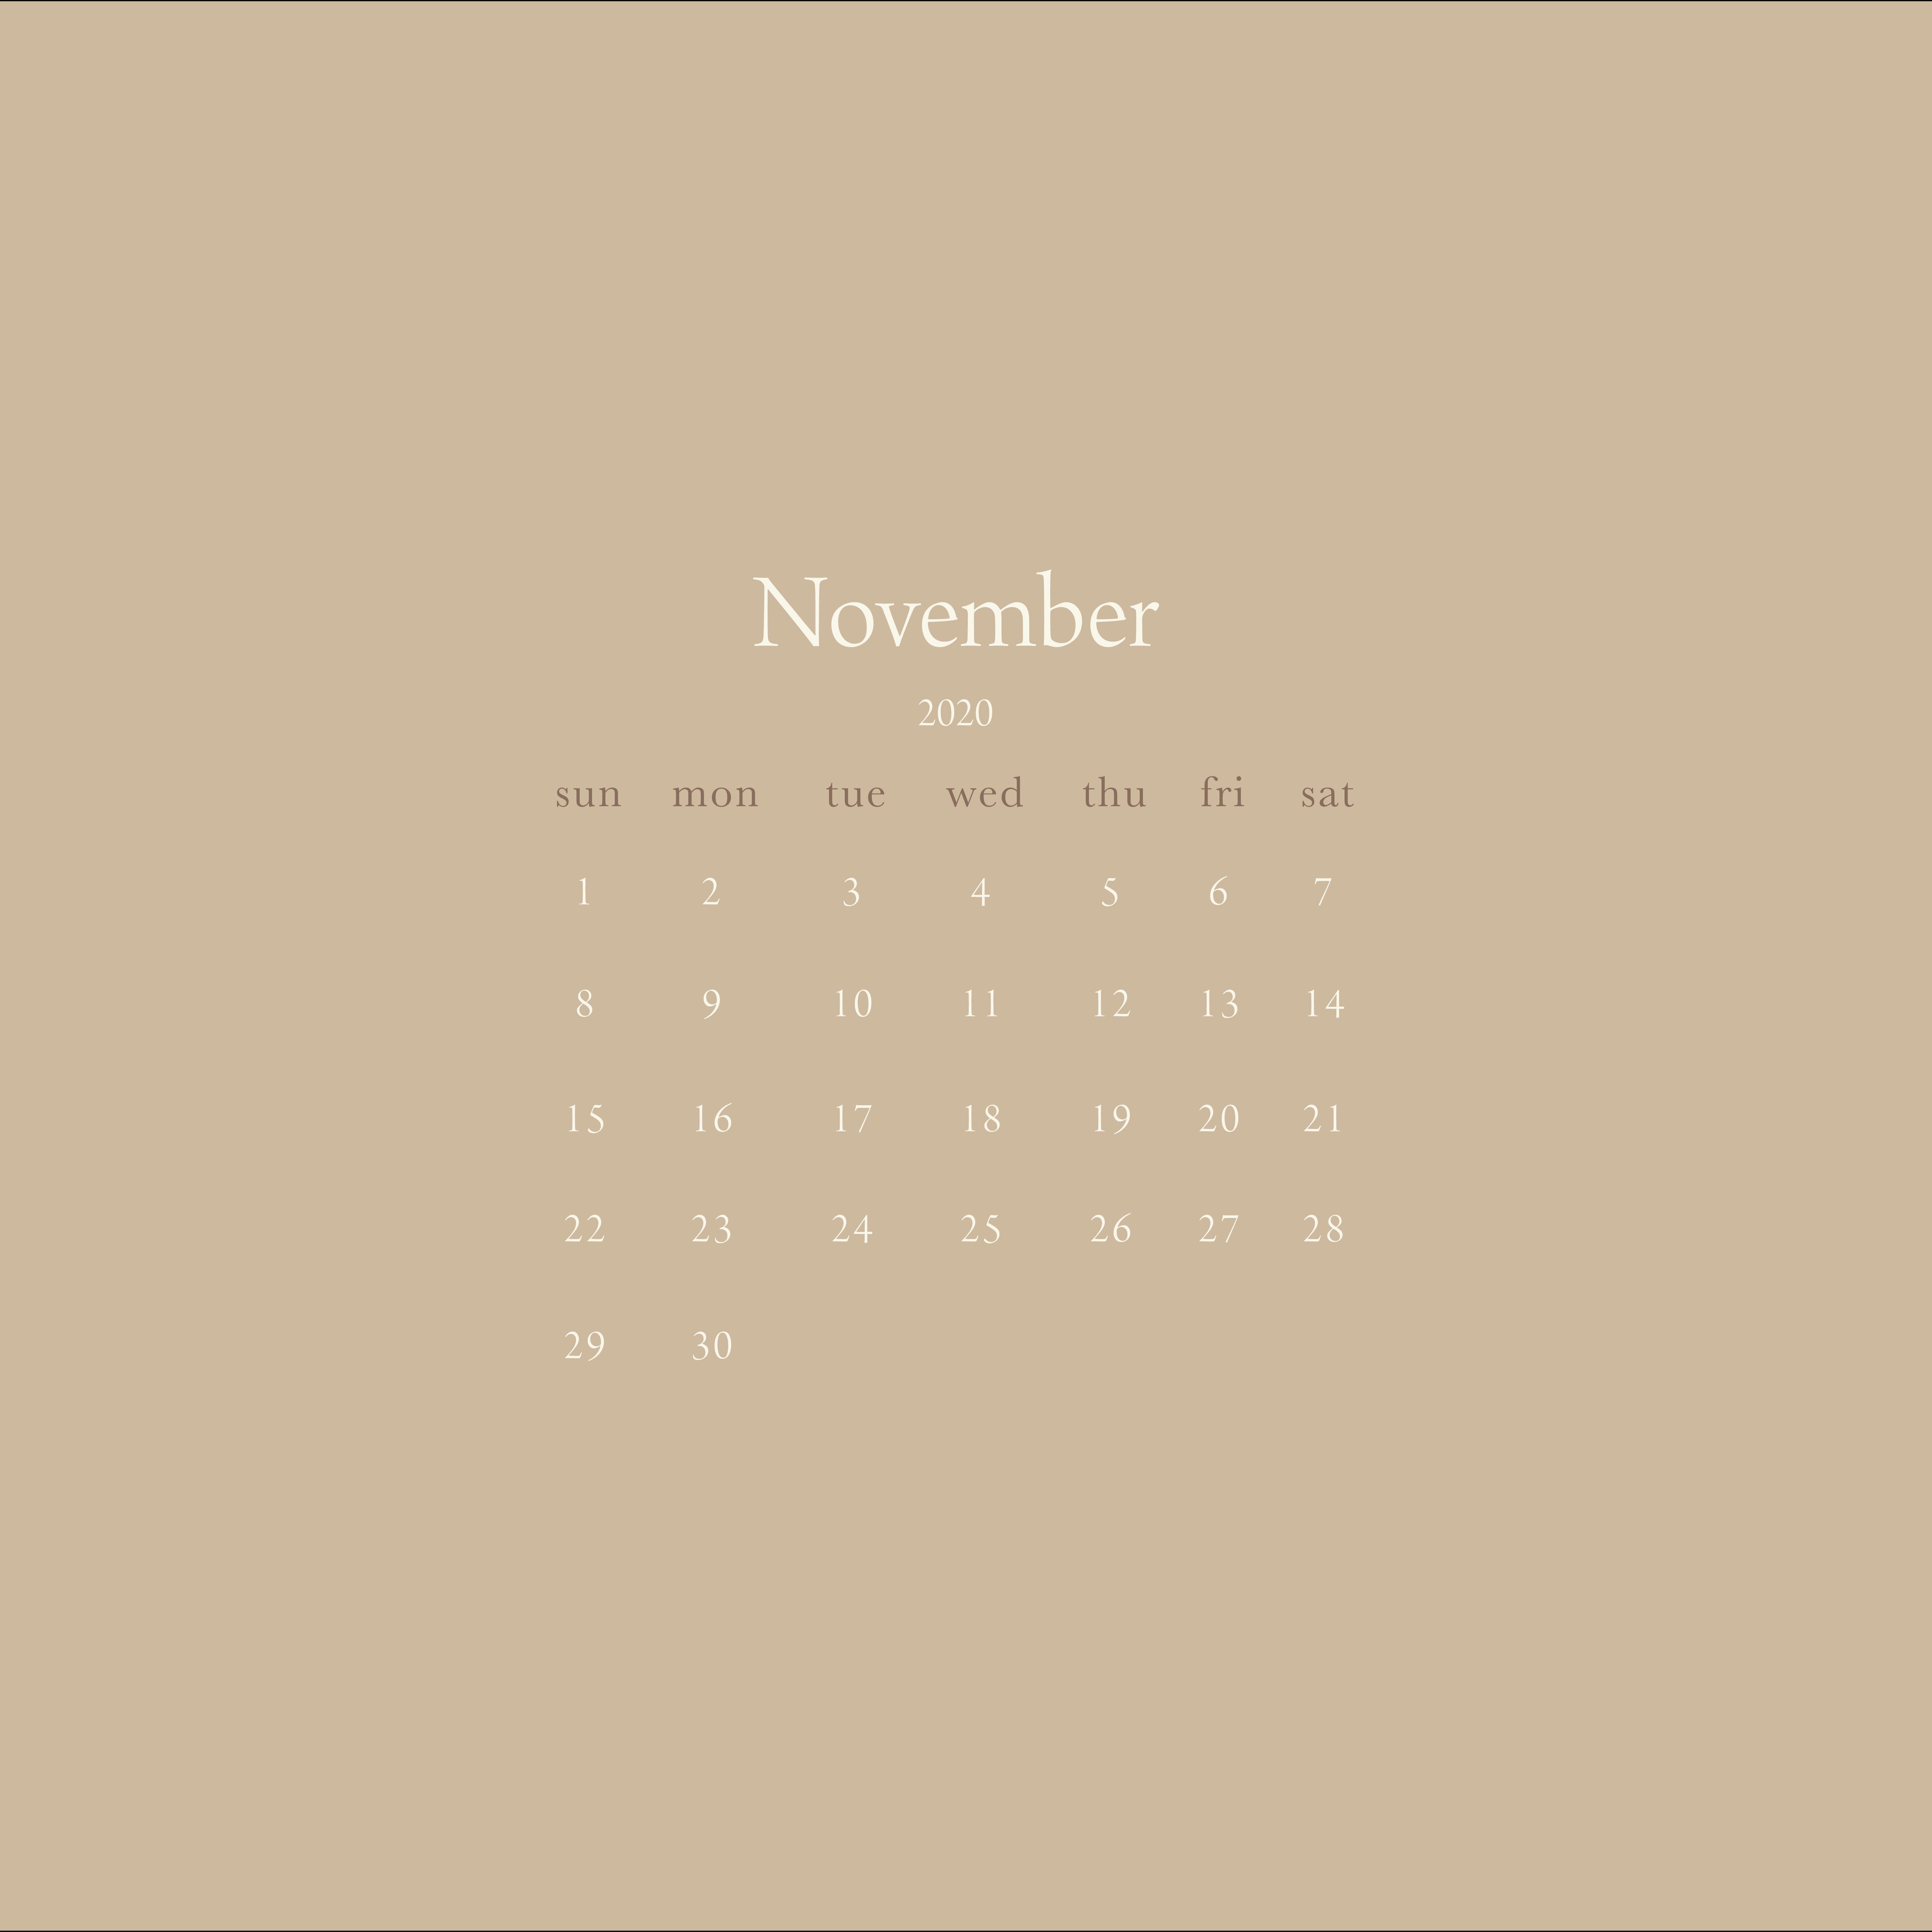 November 2020 August 2021 Minimalist Desktop Calendar Etsy Minimalist Desktop Wallpaper Desktop Wallpaper Calendar Desktop Wallpaper Macbook